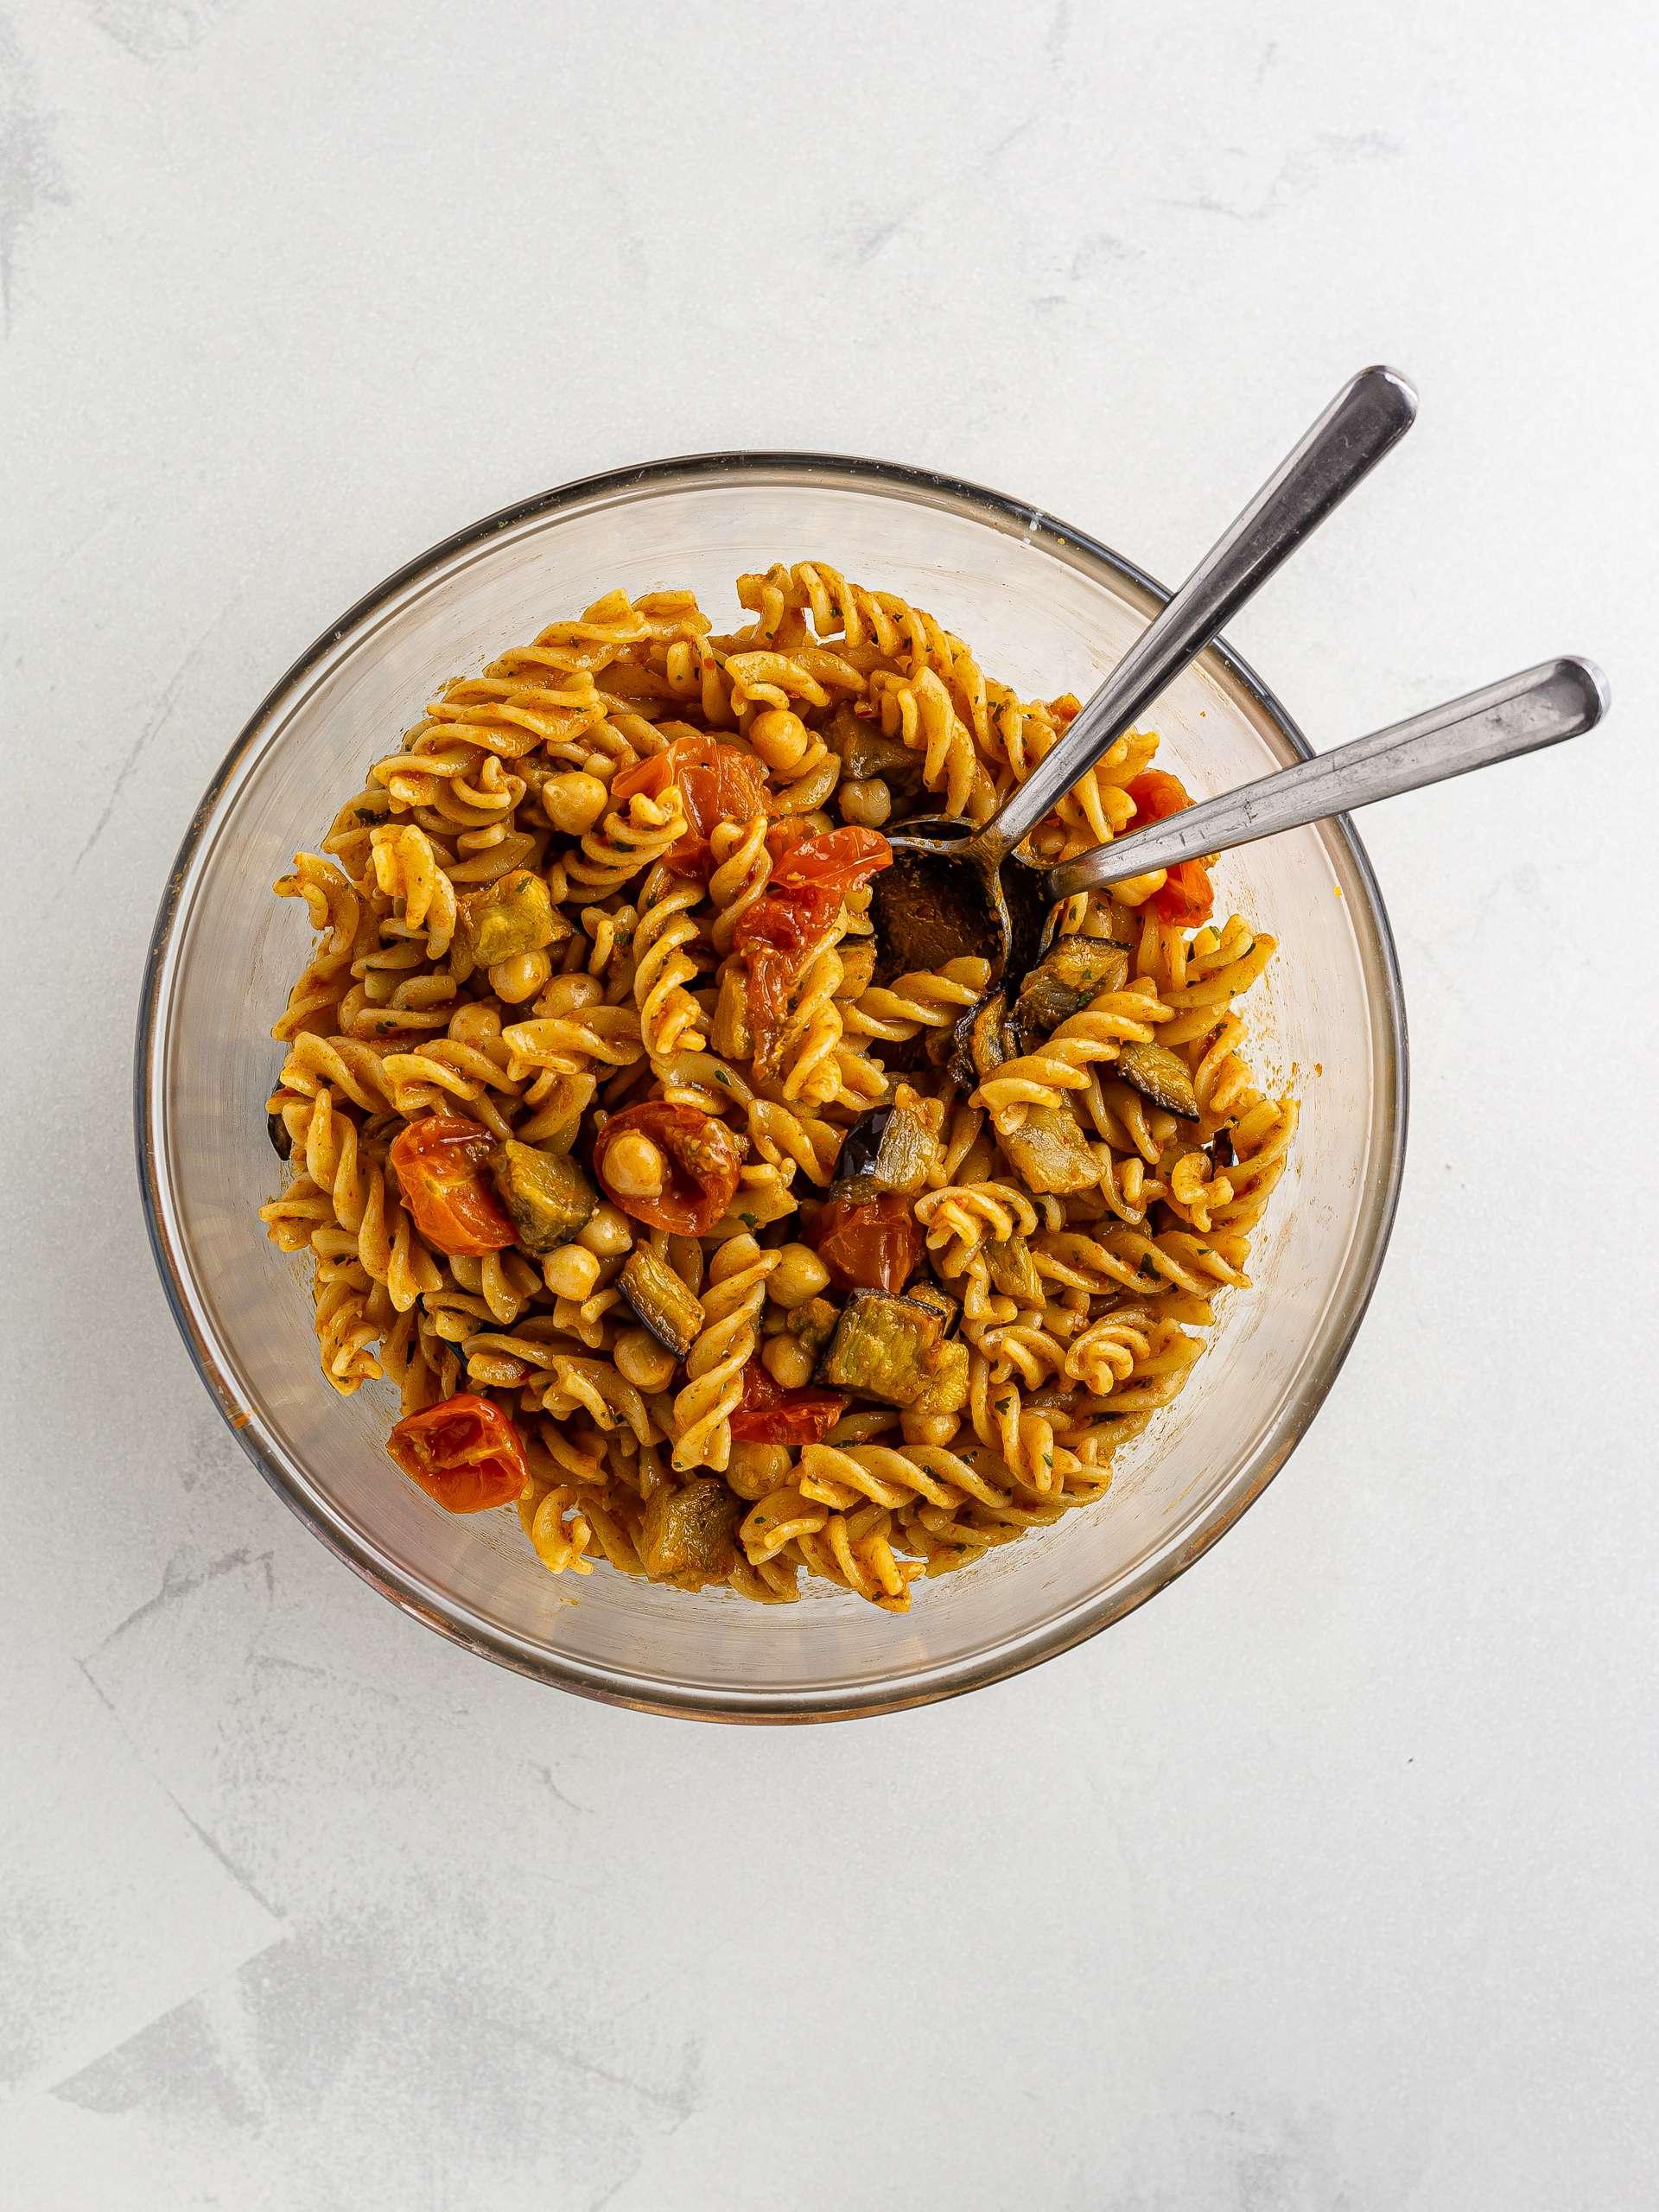 harissa pasta salad with chickpeas and aubergines